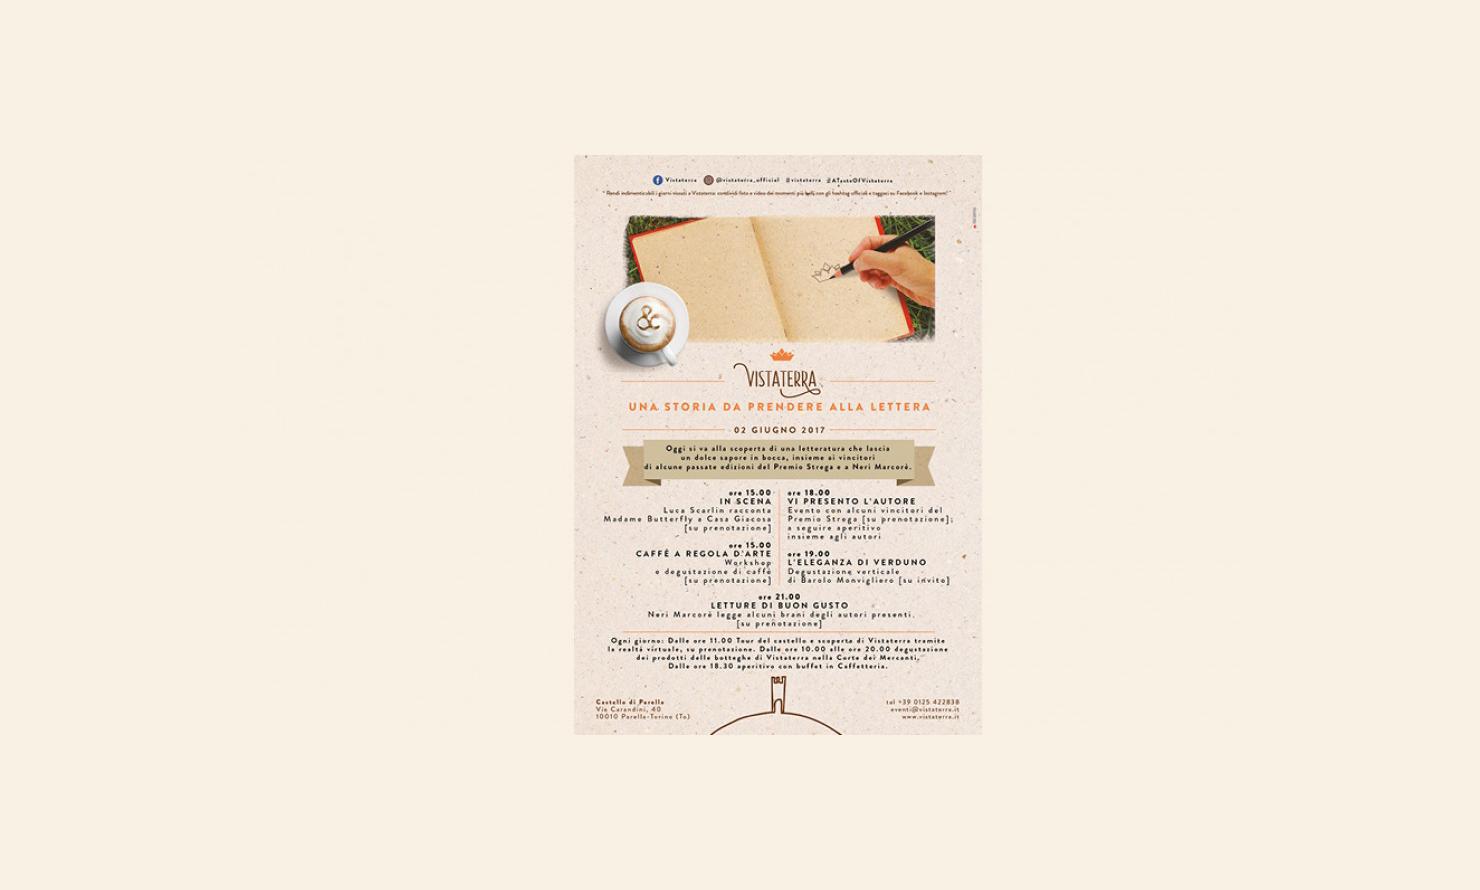 https://www.kubelibre.com/uploads/Slider-work-tutti-clienti/manital-vistaterra-comunicazione-integrata-4.jpg